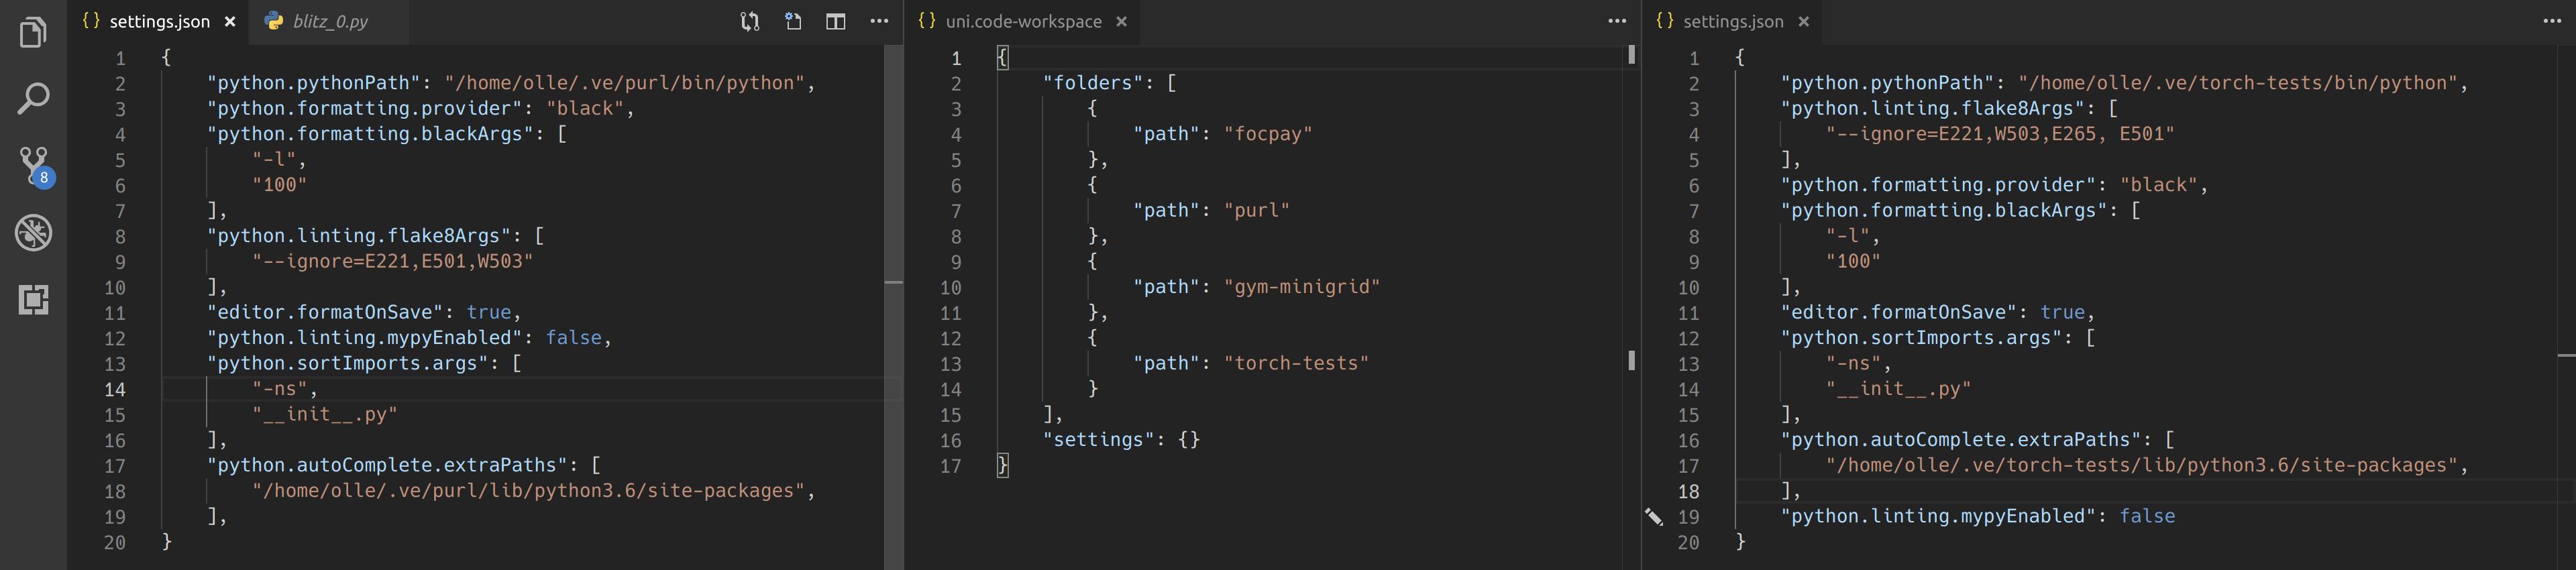 pipenv_venv_in_project windows